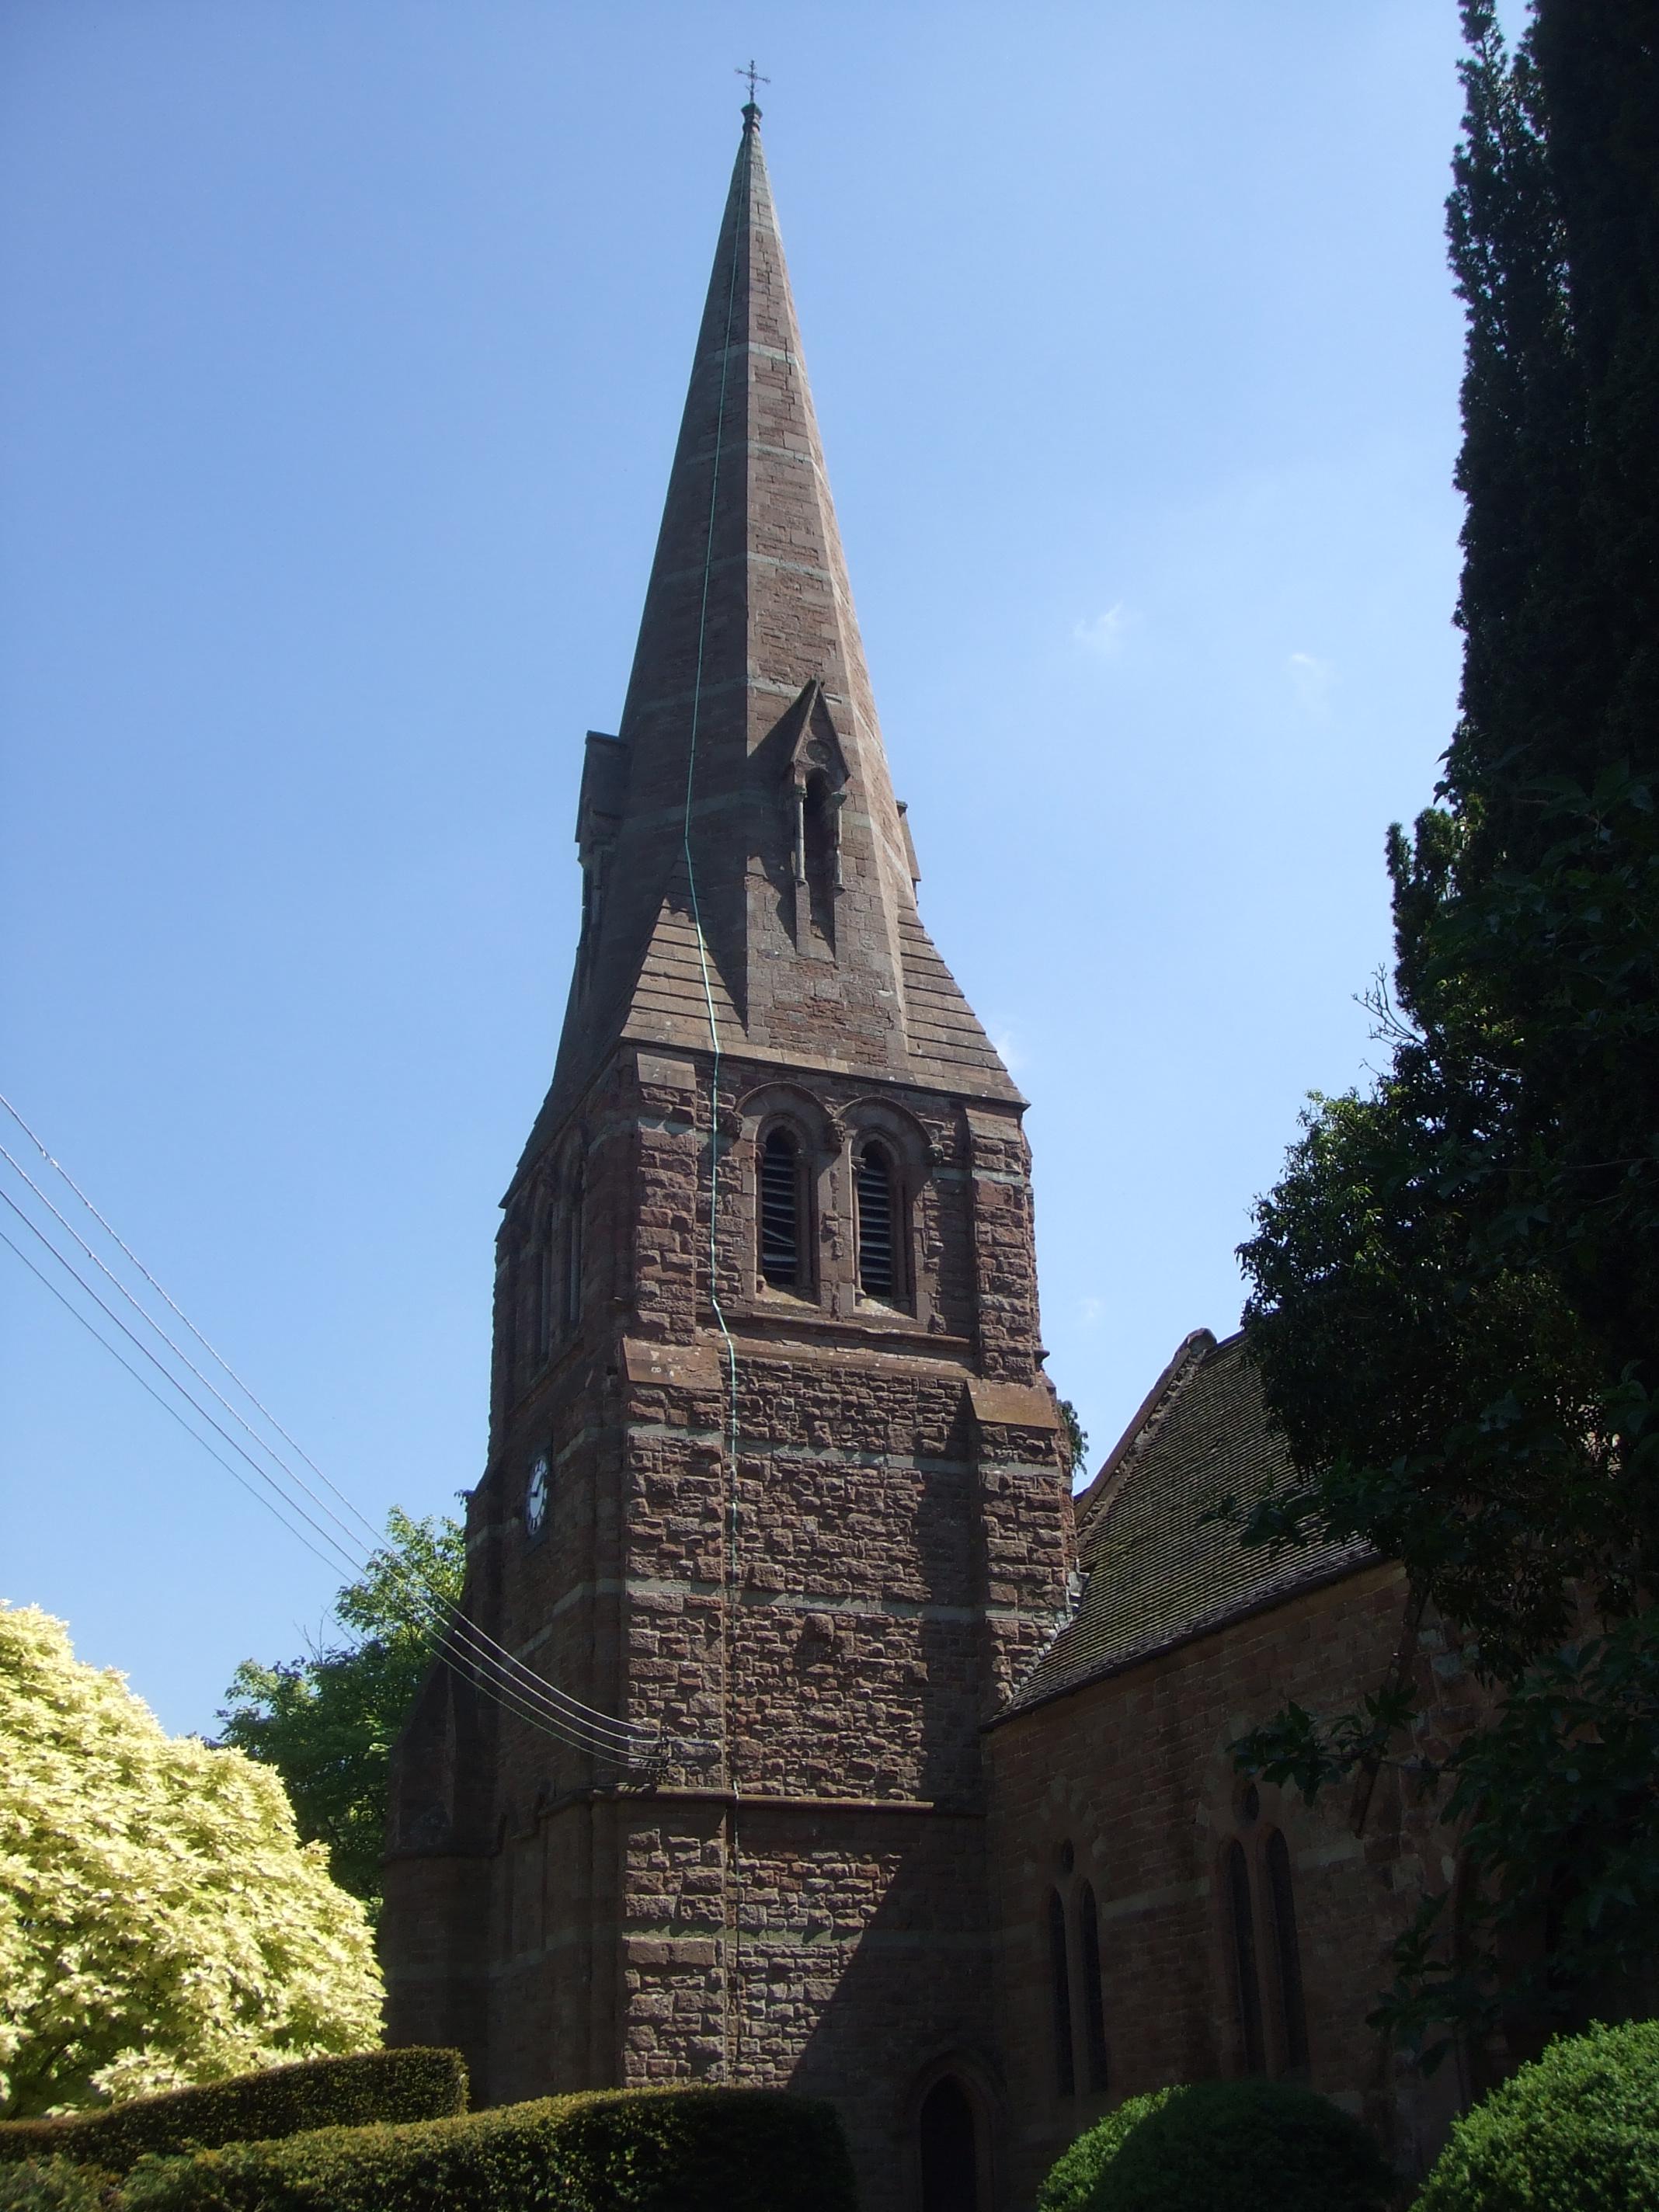 Chetwynd, St Michael and All Angels (c) Aidan McRae Thomson